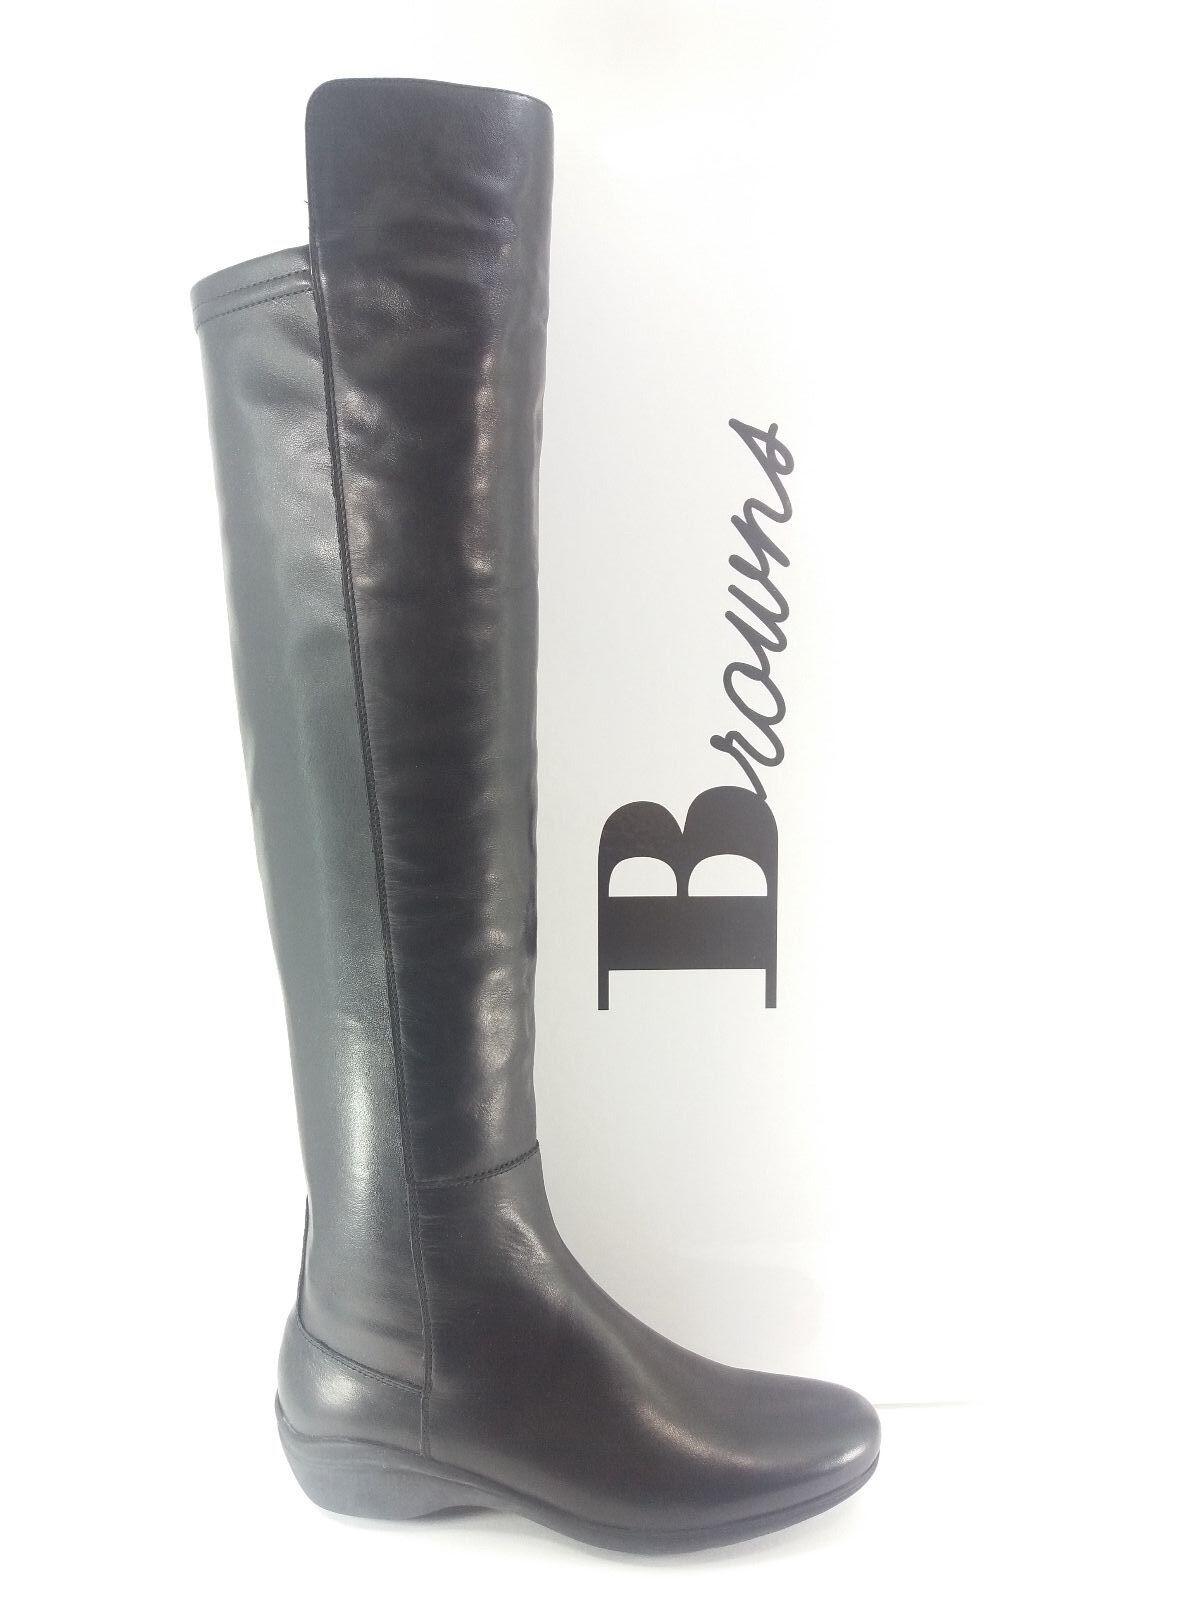 Zapatos señora zapatos i16-br 36 36 36 marróns botas negro 100% cuero Made in   en stock